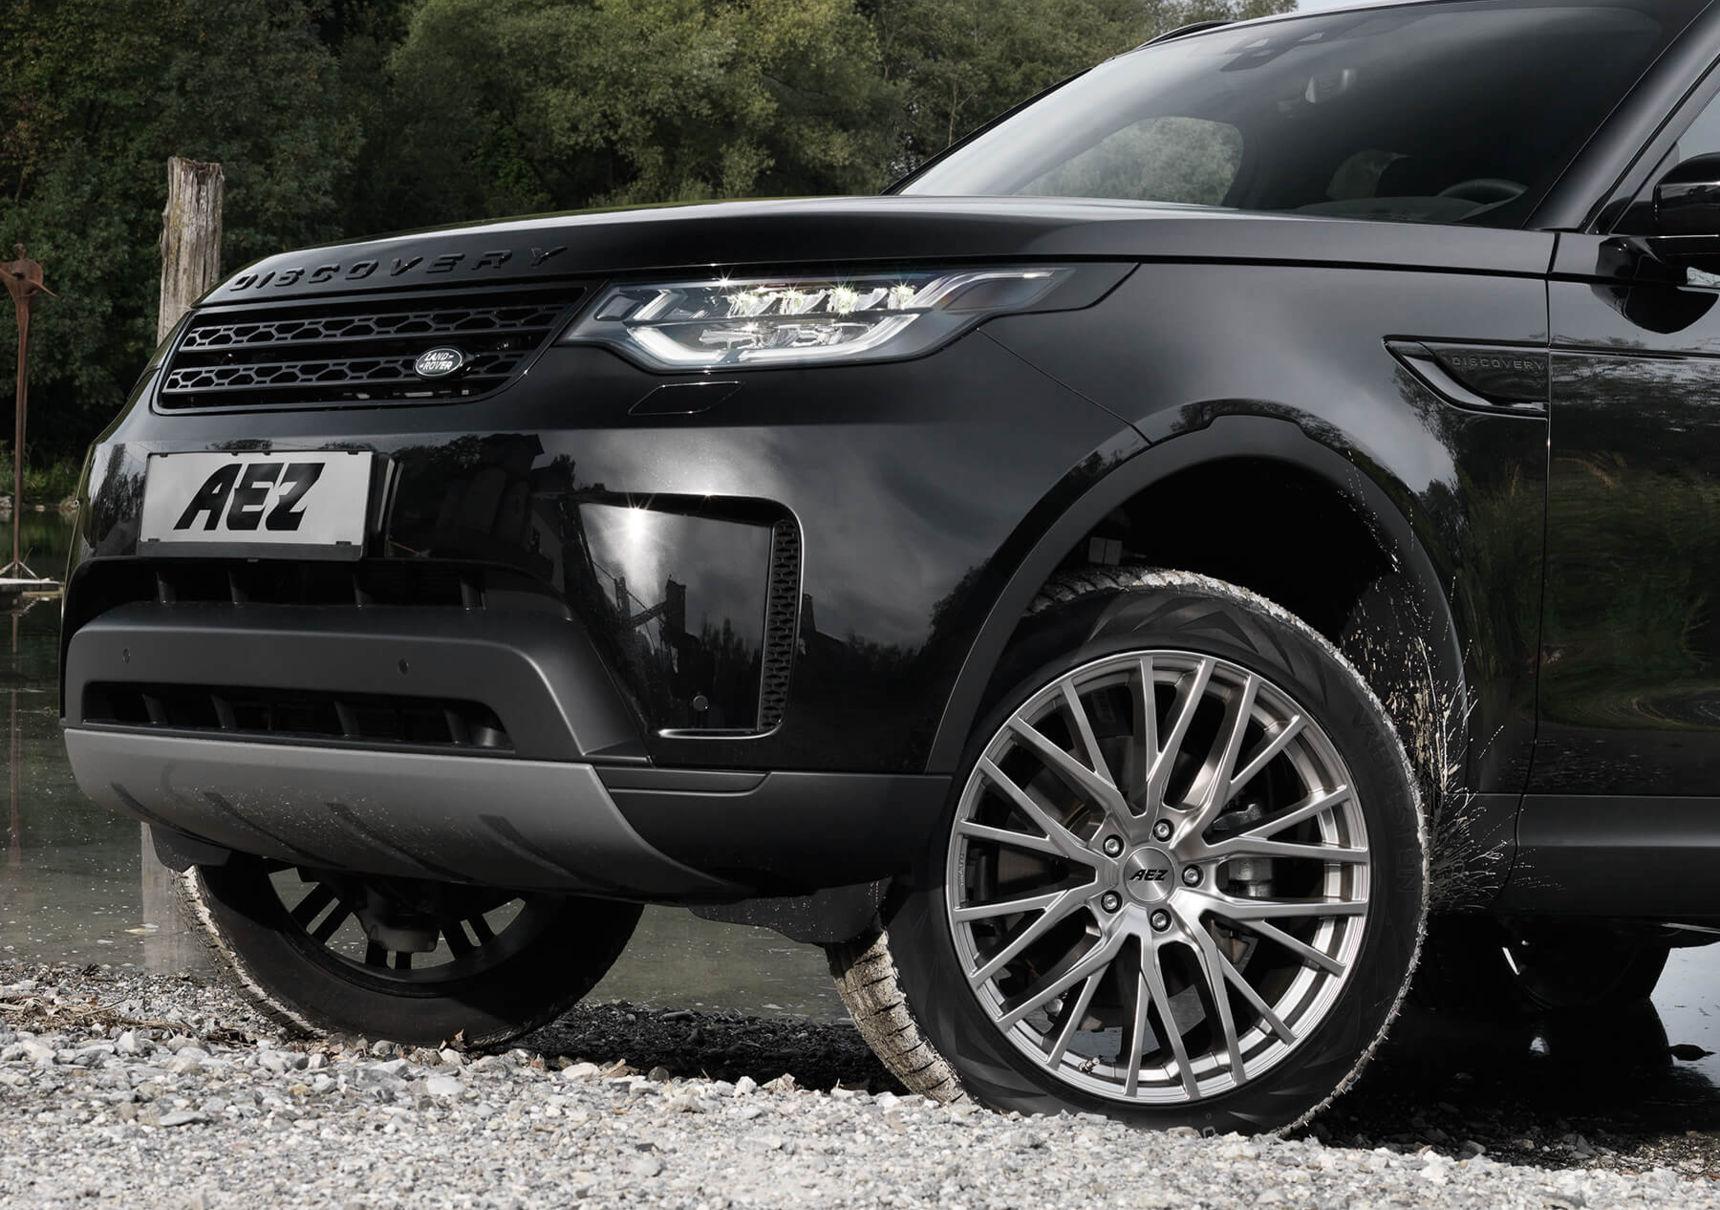 Range Rover Configurator >> AEZ Panama high gloss | AEZ news